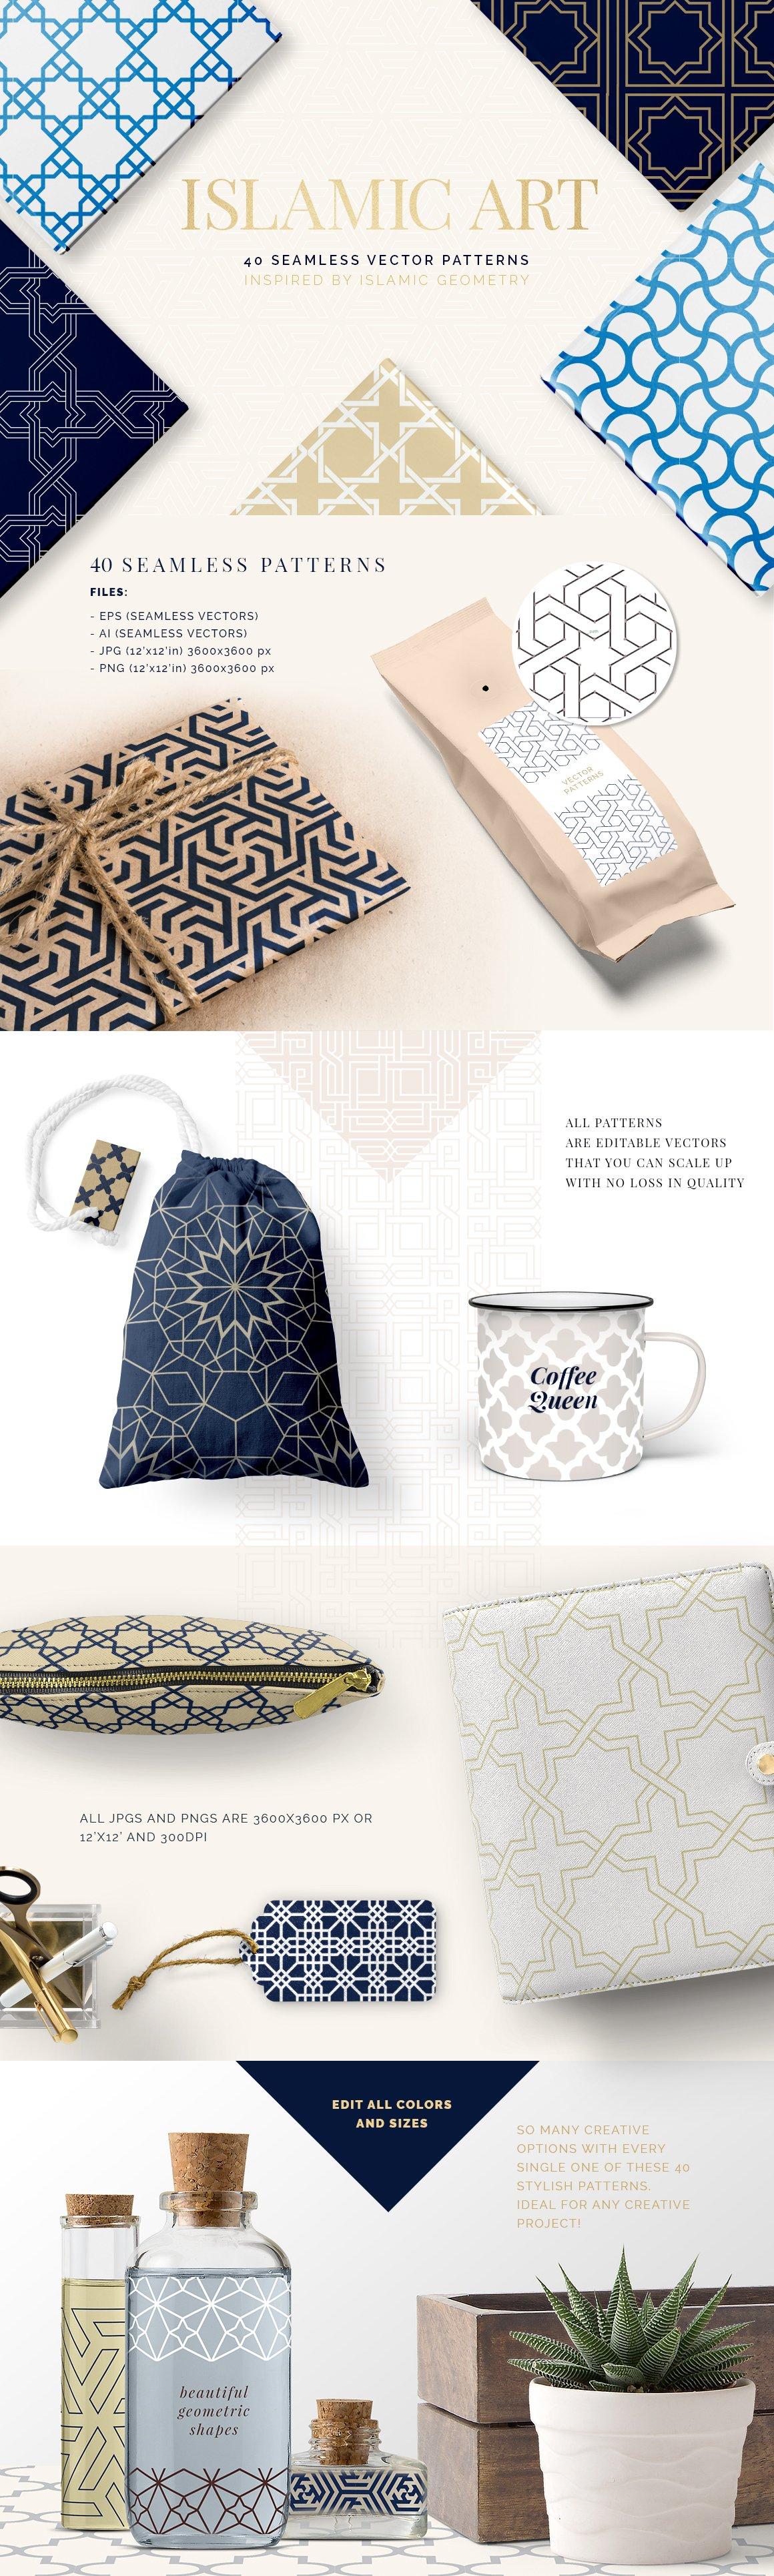 Islamic Art Vector Patterns ~ Graphic Patterns ~ Creative Market